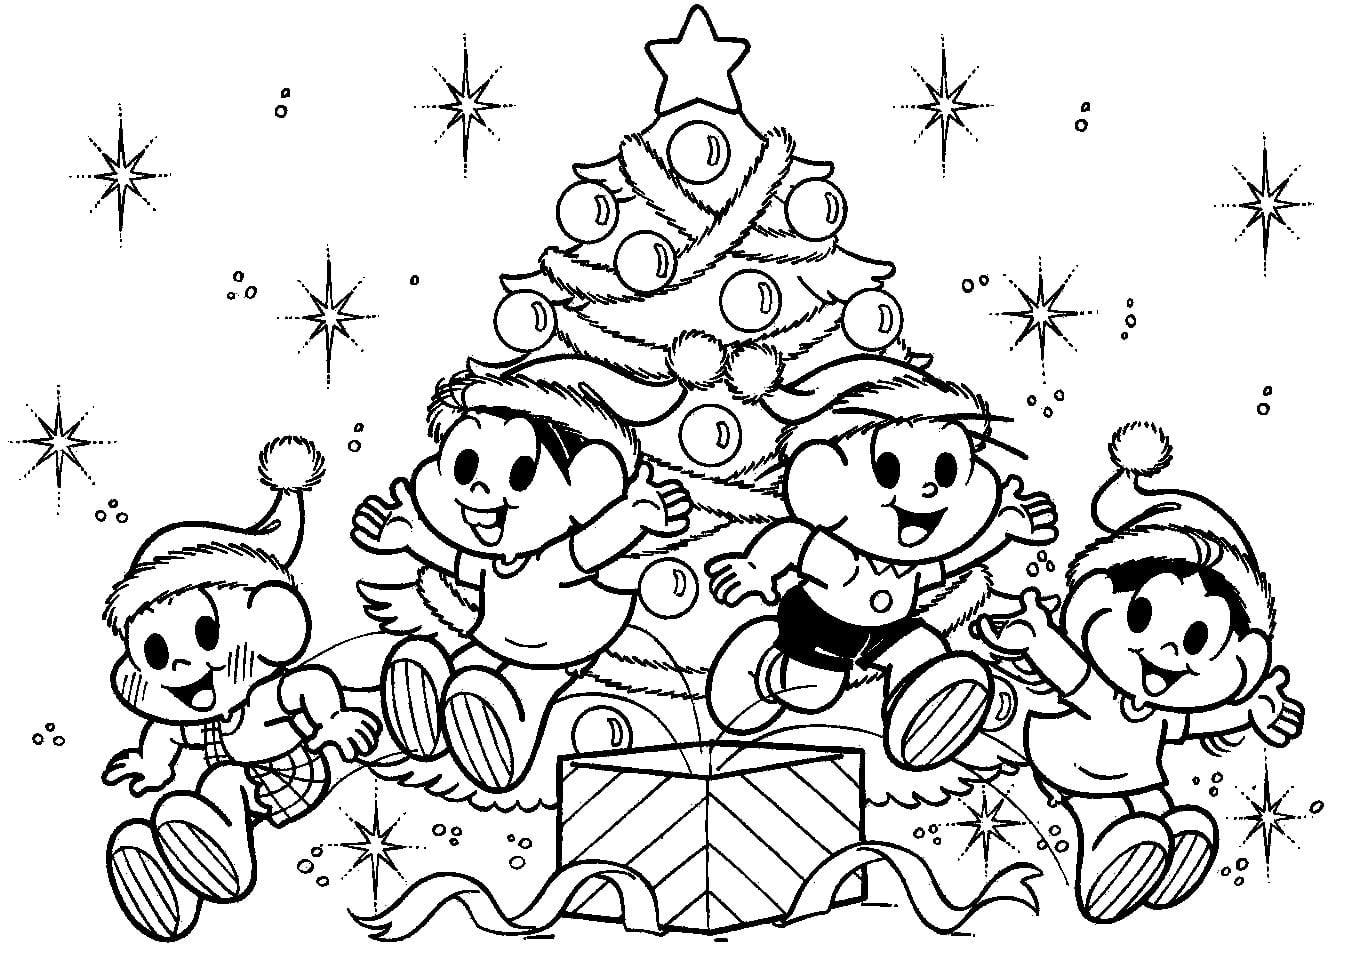 40 Desenhos E Moldes De Árvore De Natal Para Colorir, Pintar